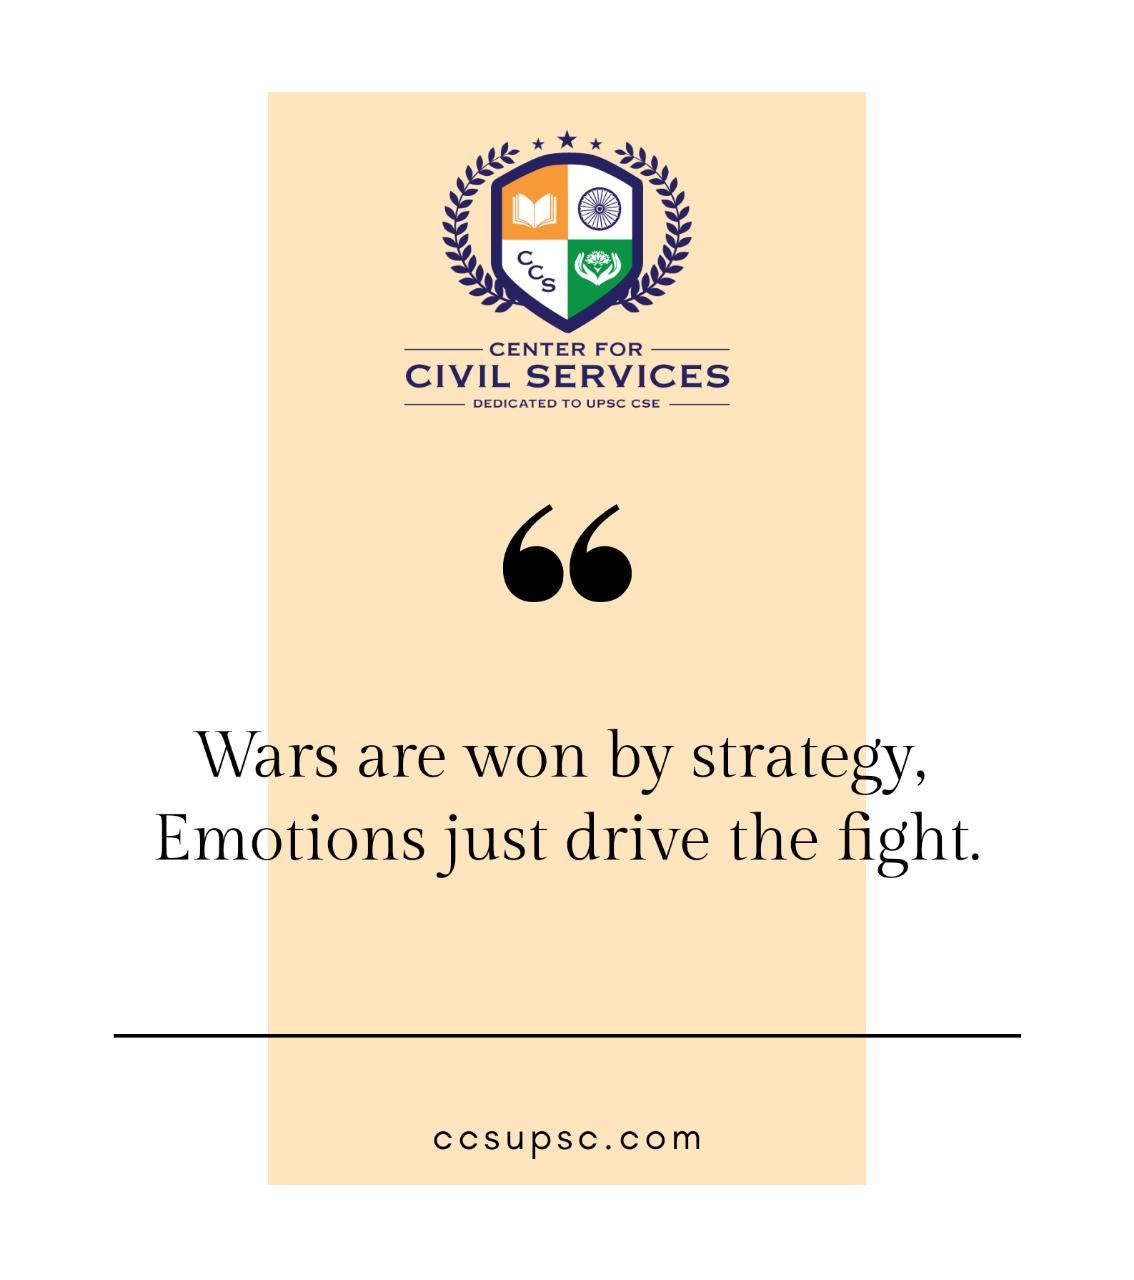 UPSC Preparation Self Study Strategy